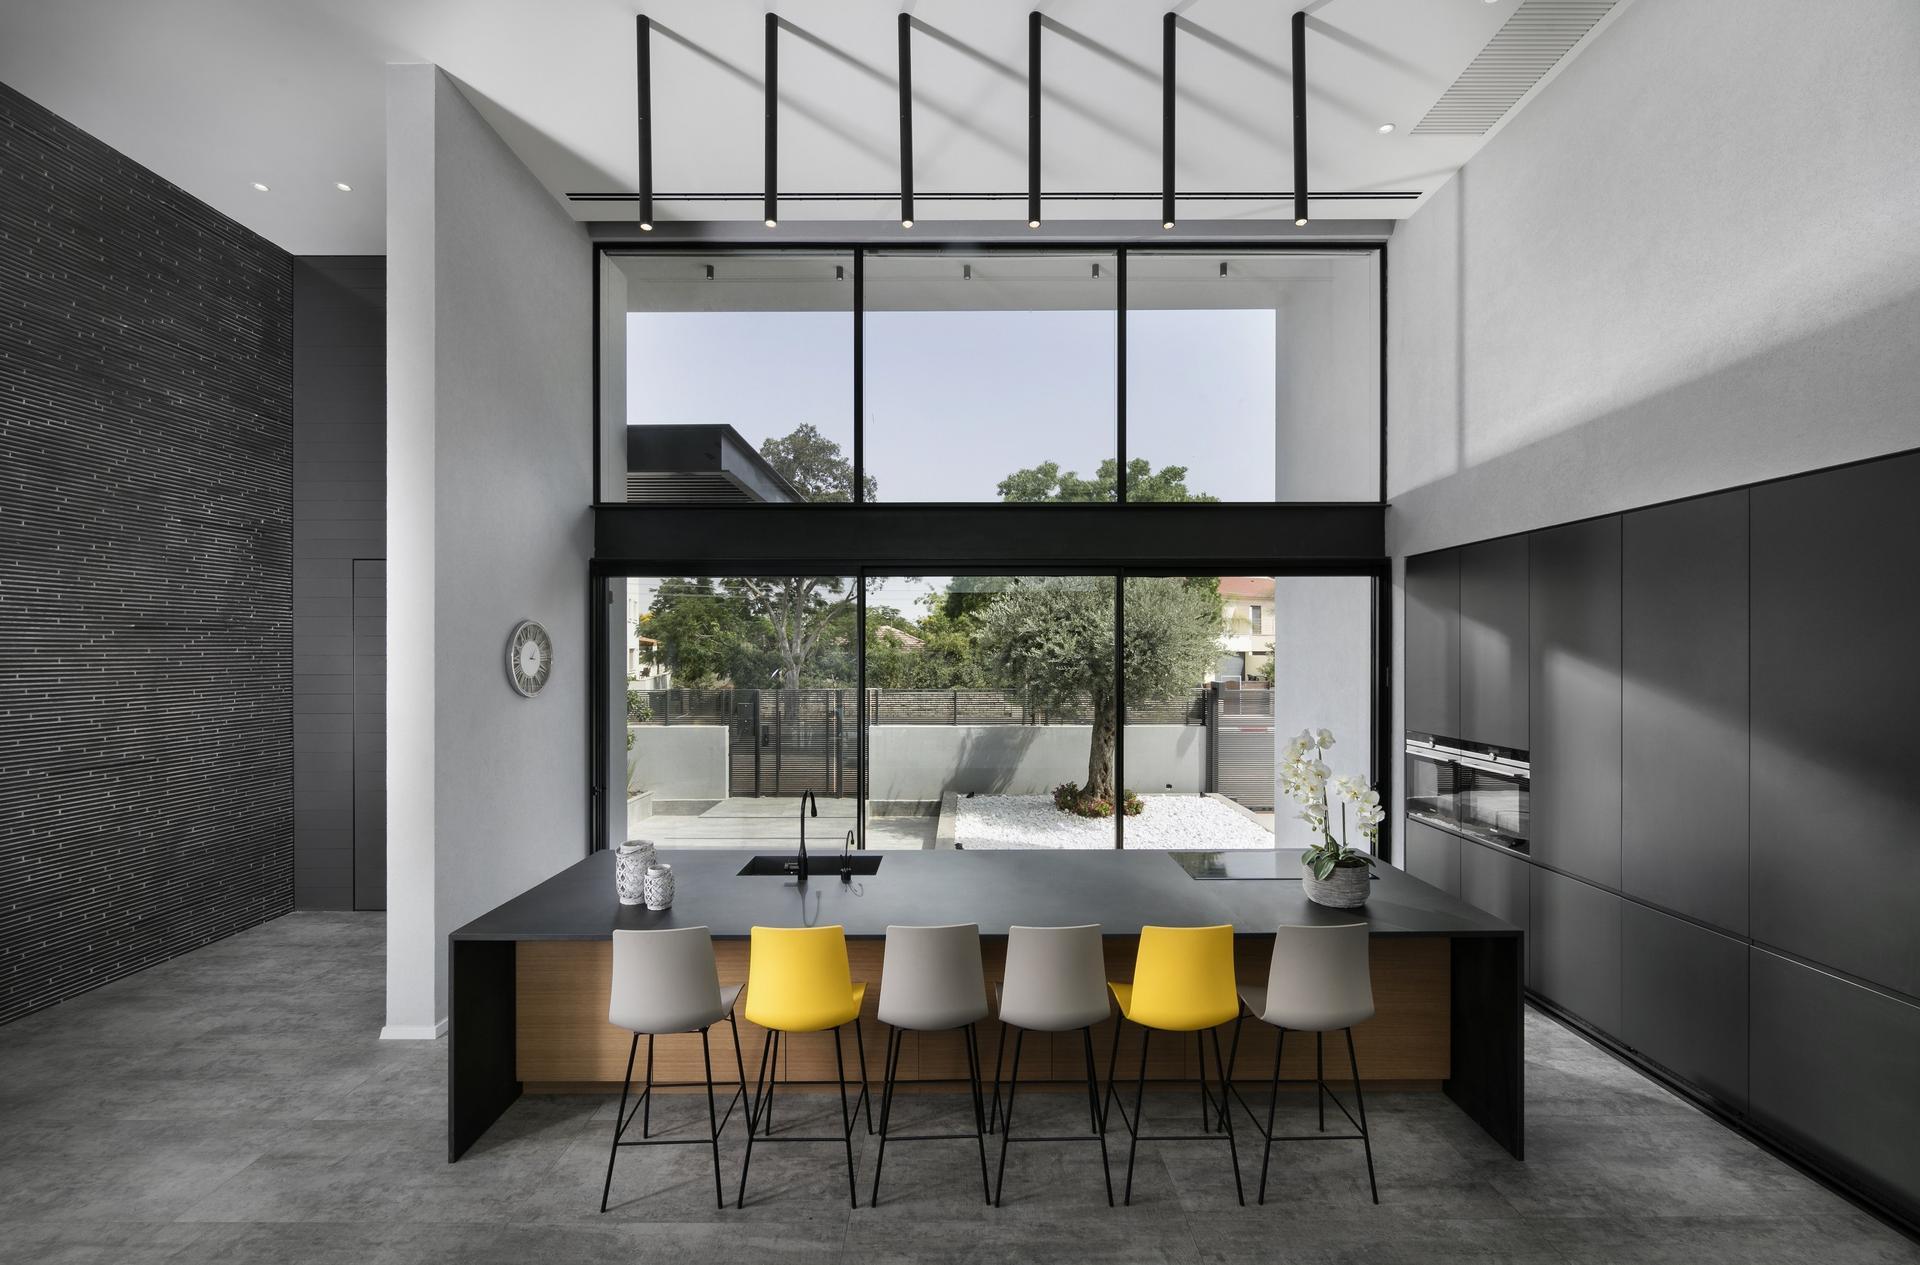 משטחי למינם, תכנון אדריכלית יעלה דגנית איבגי. צילום: אלעד גונן